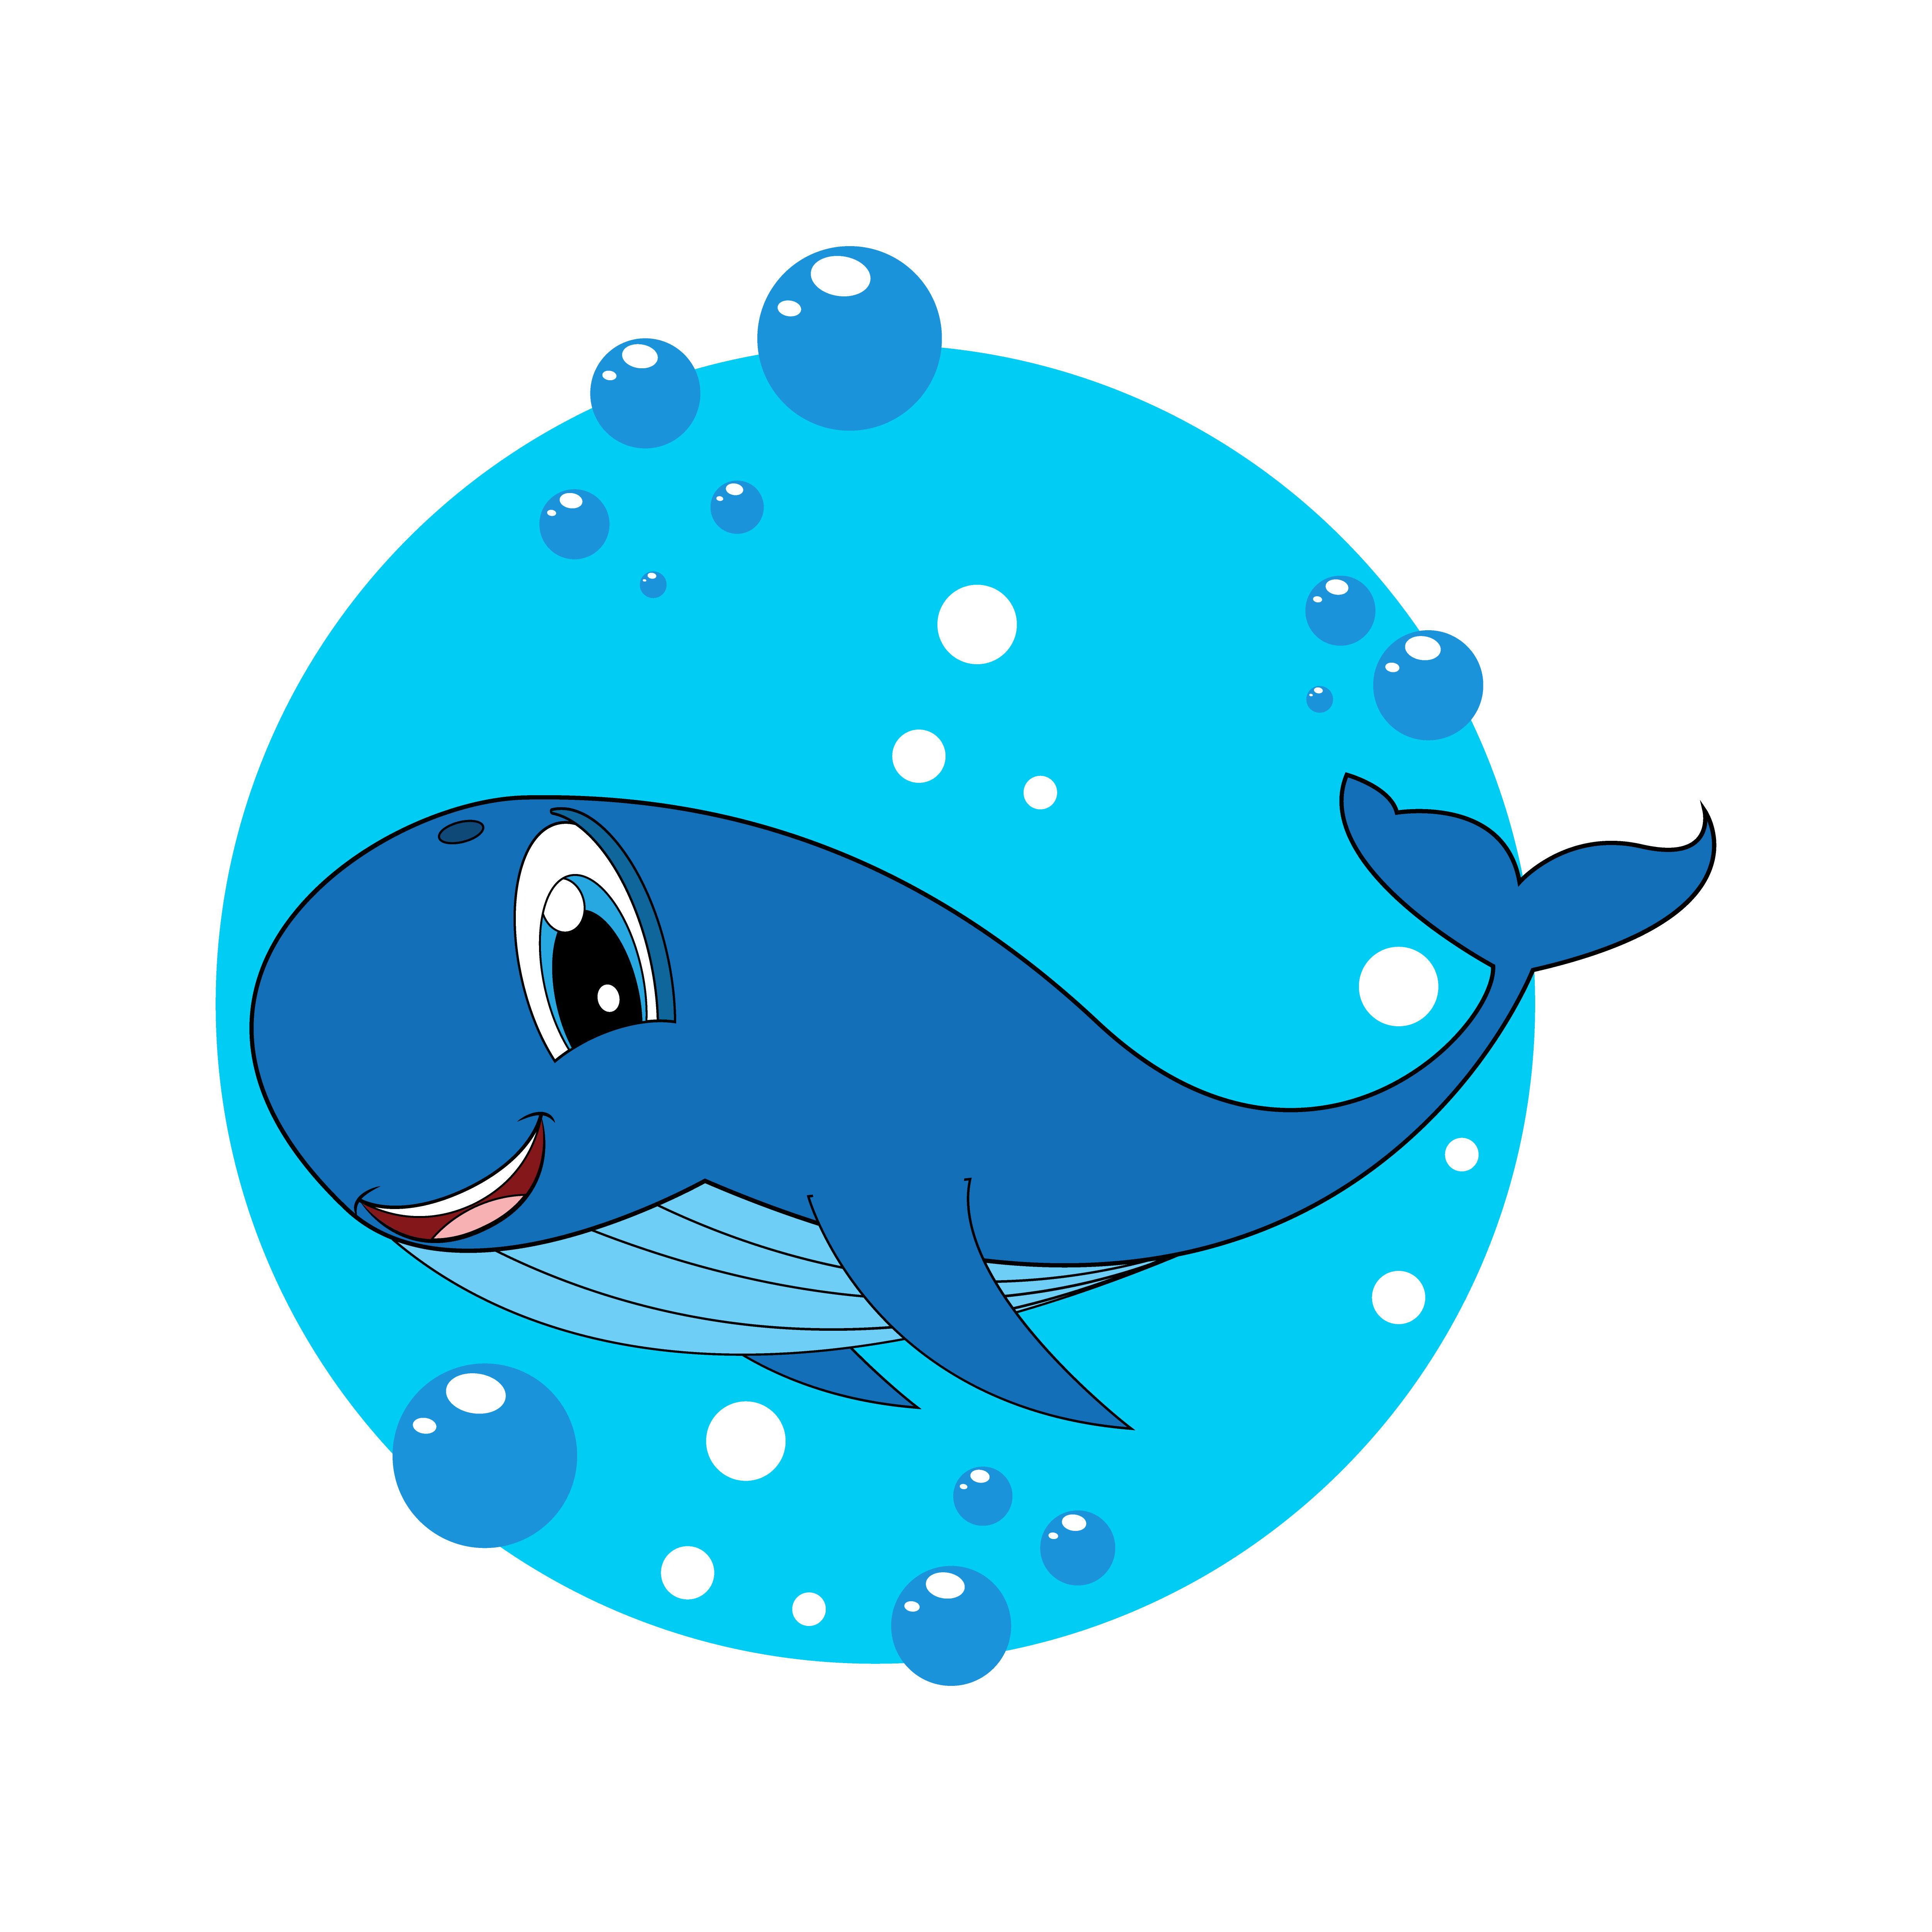 Cute Whale Cartoon Simple Vector Illustration By Curutdesign Thehungryjpeg Com